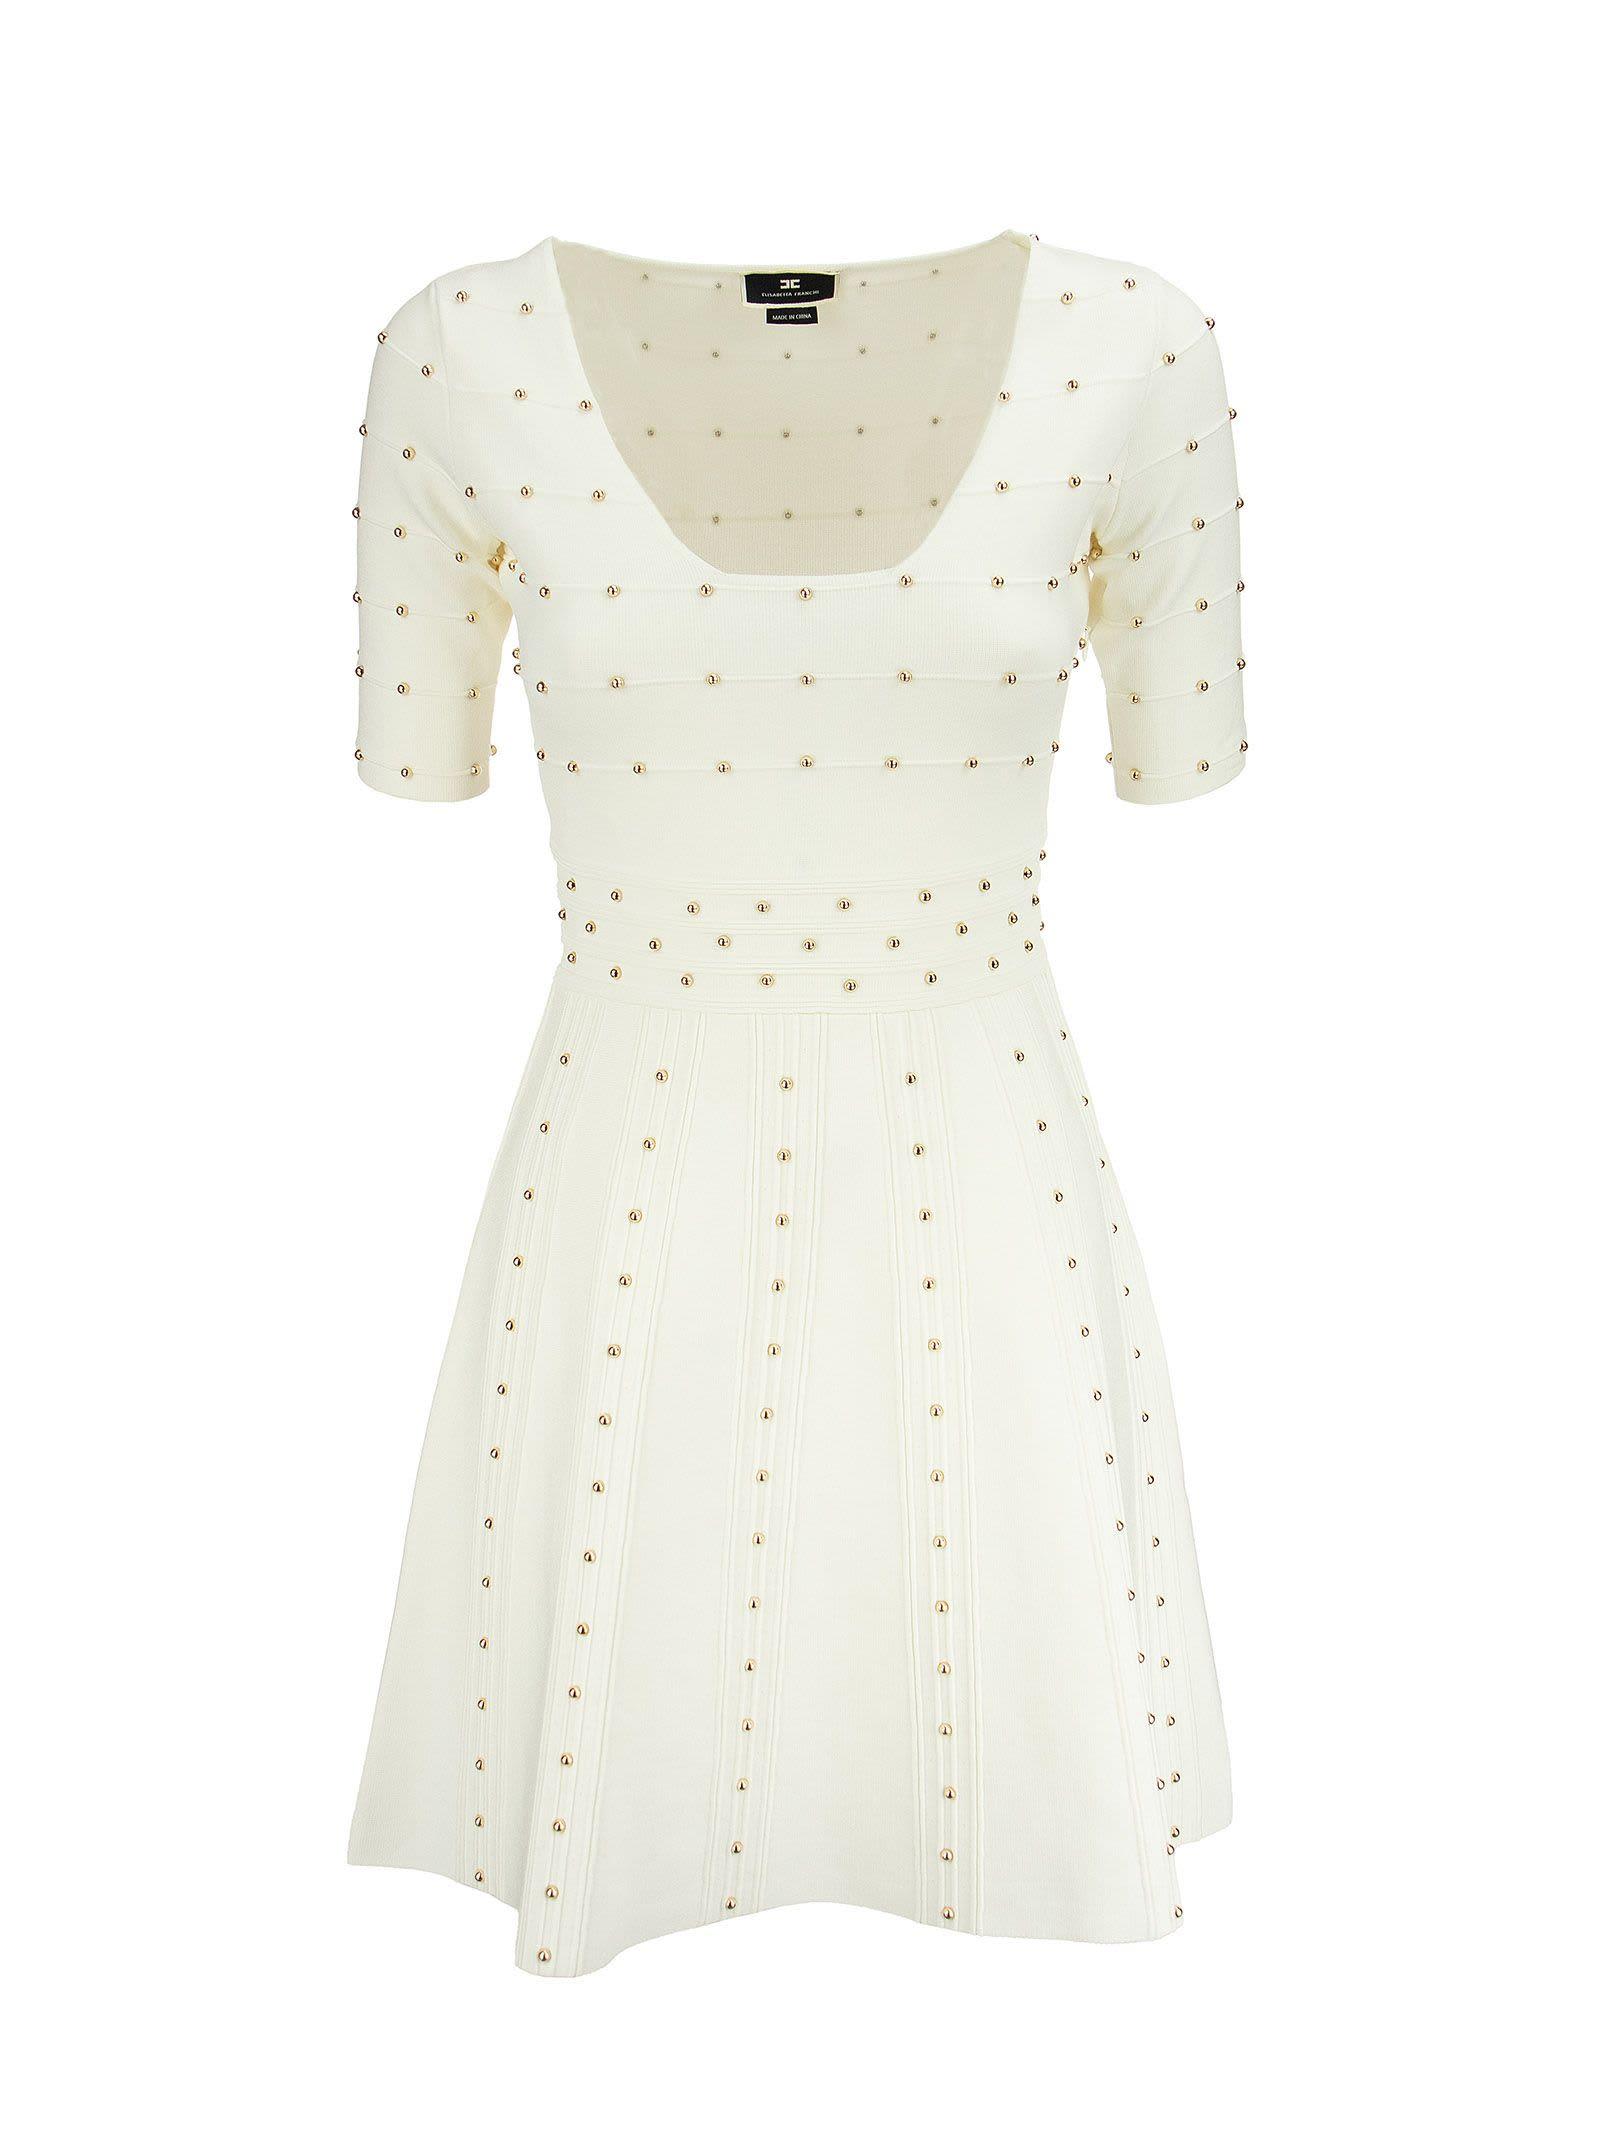 Buy Elisabetta Franchi Knit Mini Dress With Small Studs online, shop Elisabetta Franchi with free shipping